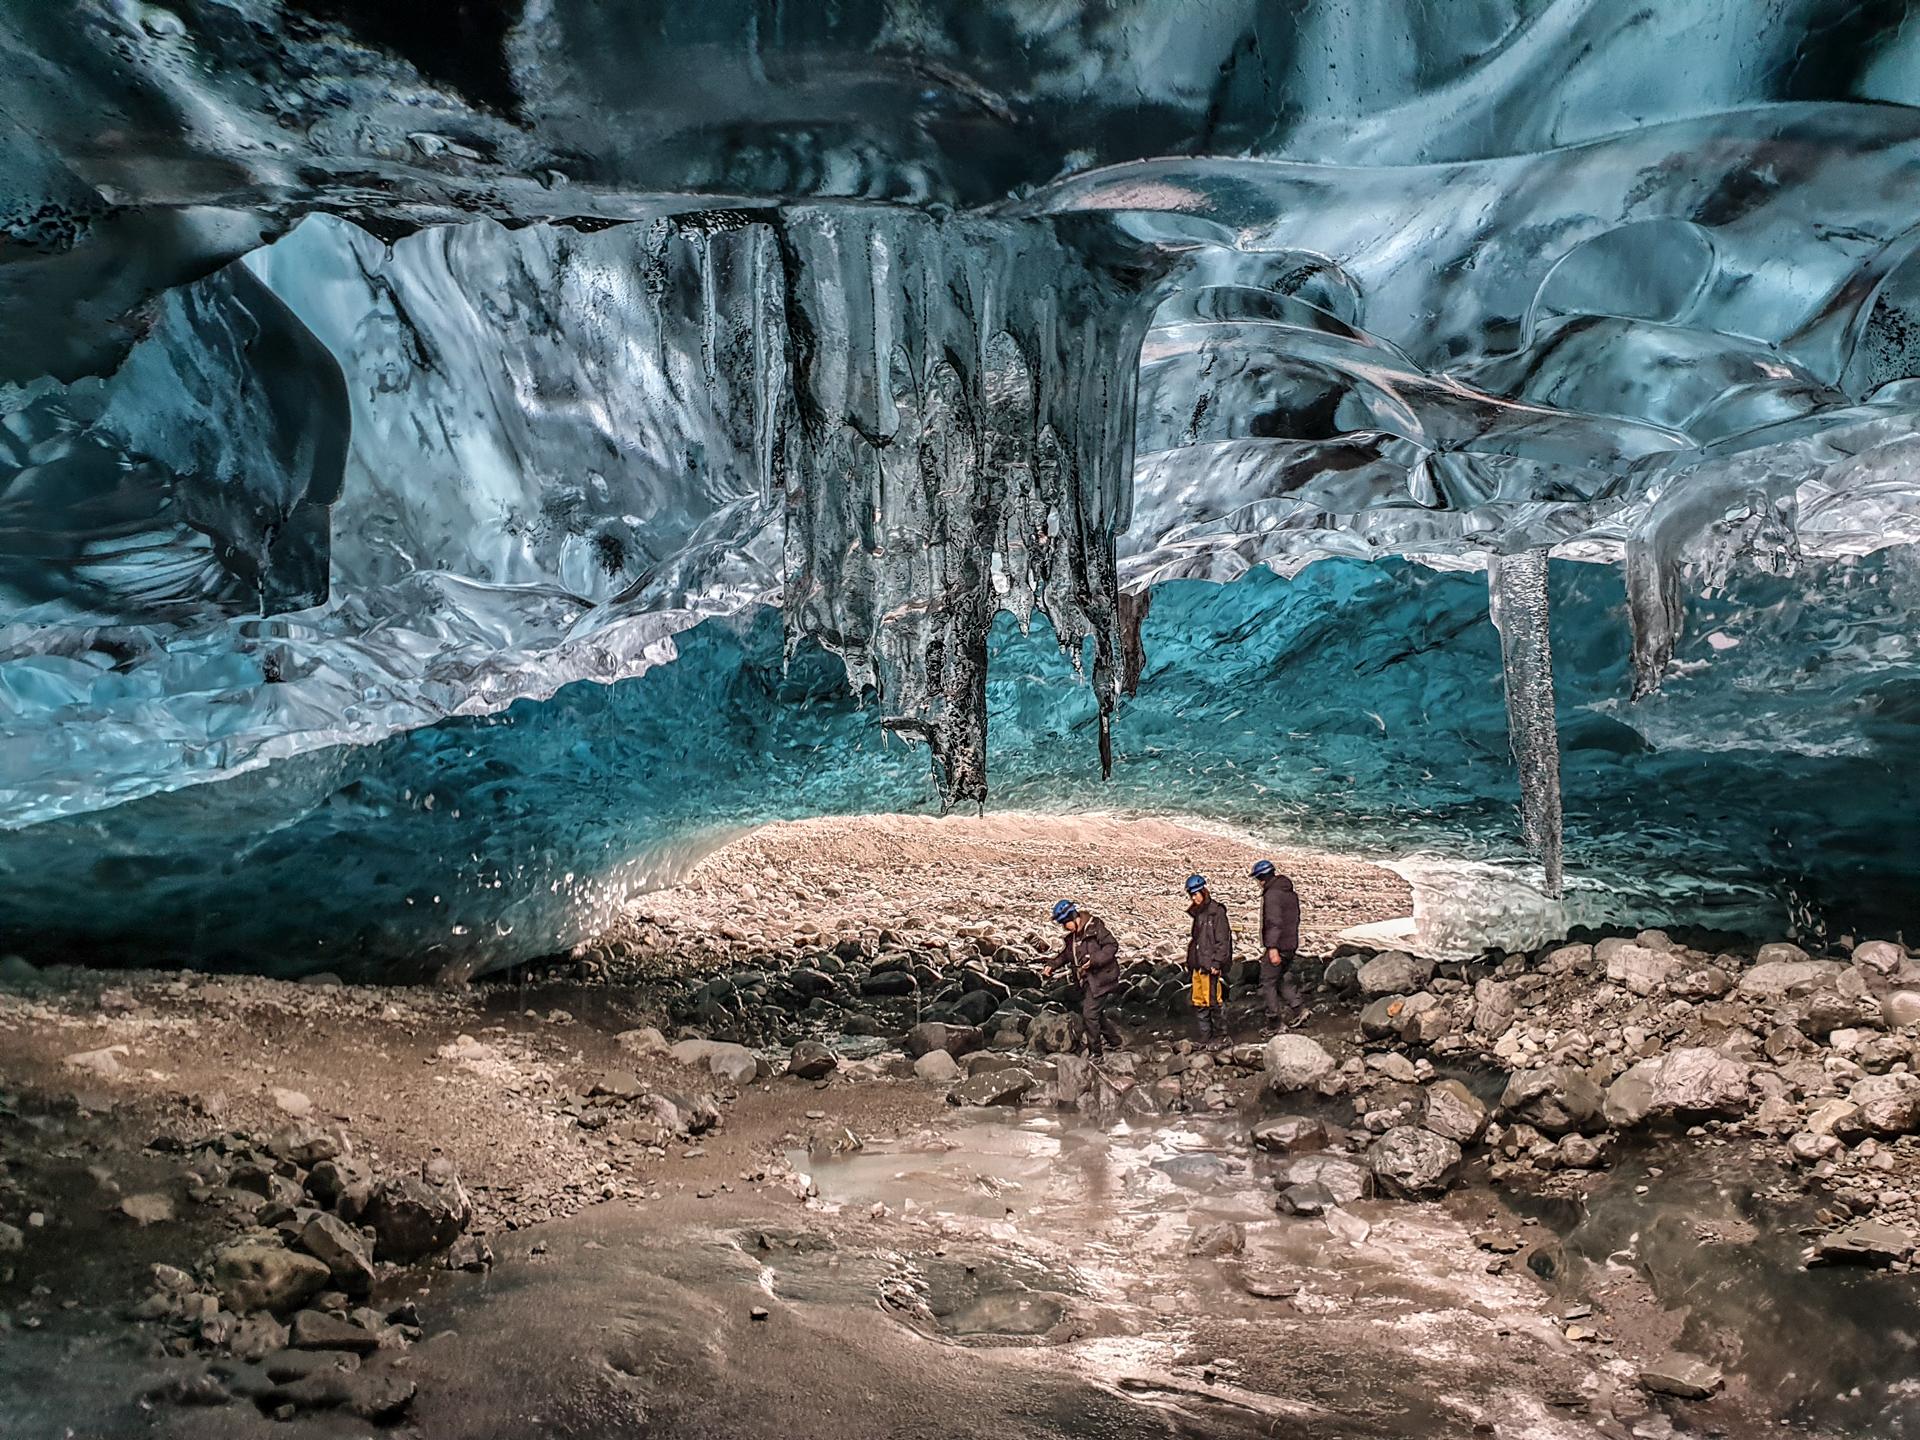 saphire ice cave